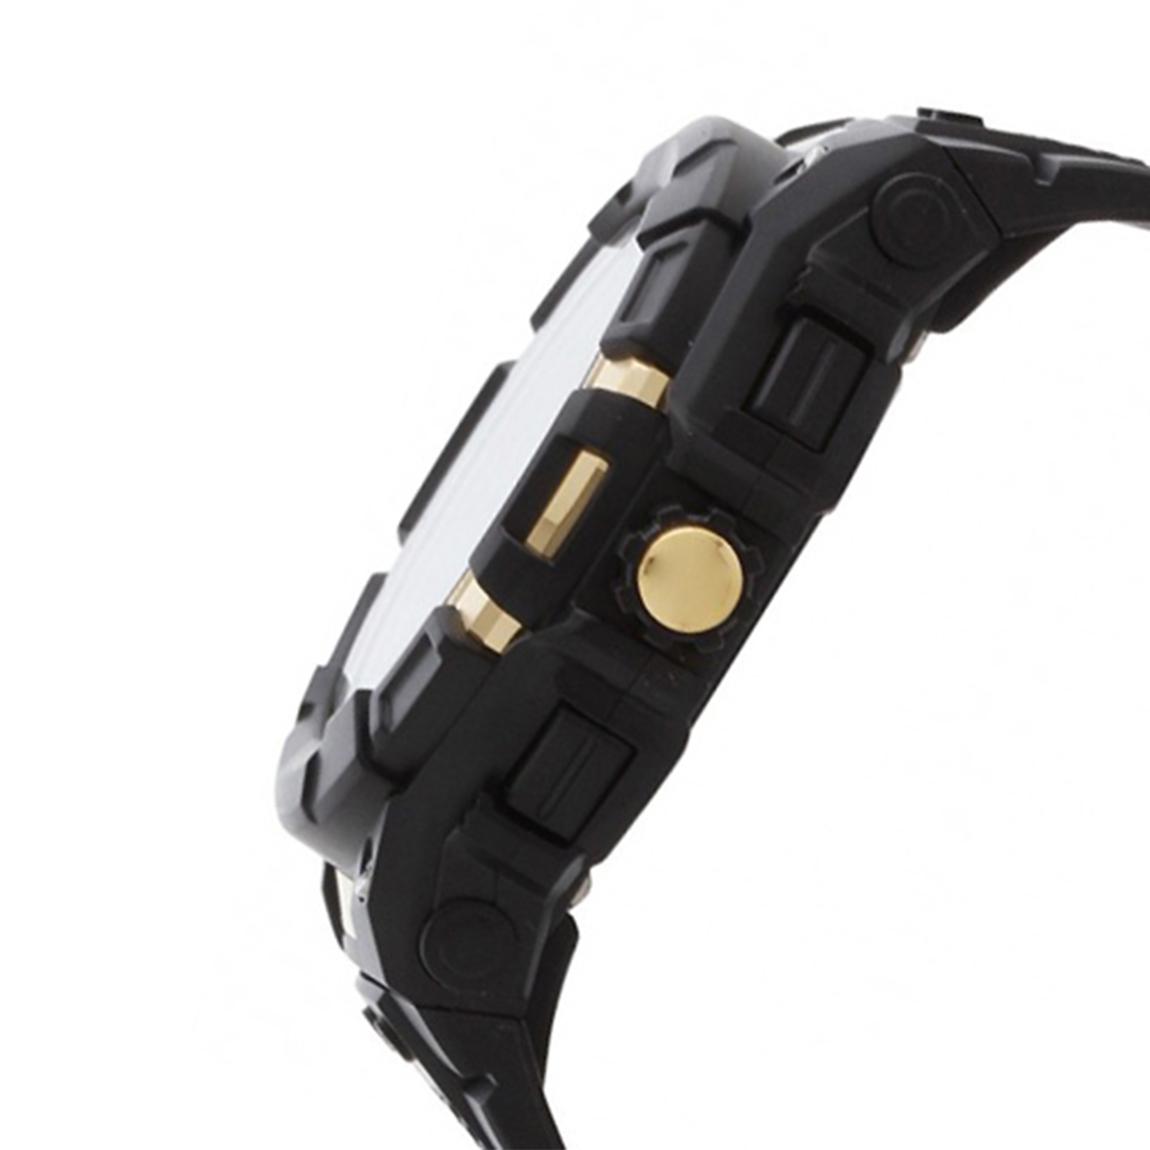 ساعت مچی دیجیتال مردانه کیو اند کیو مدل cv-32             قیمت